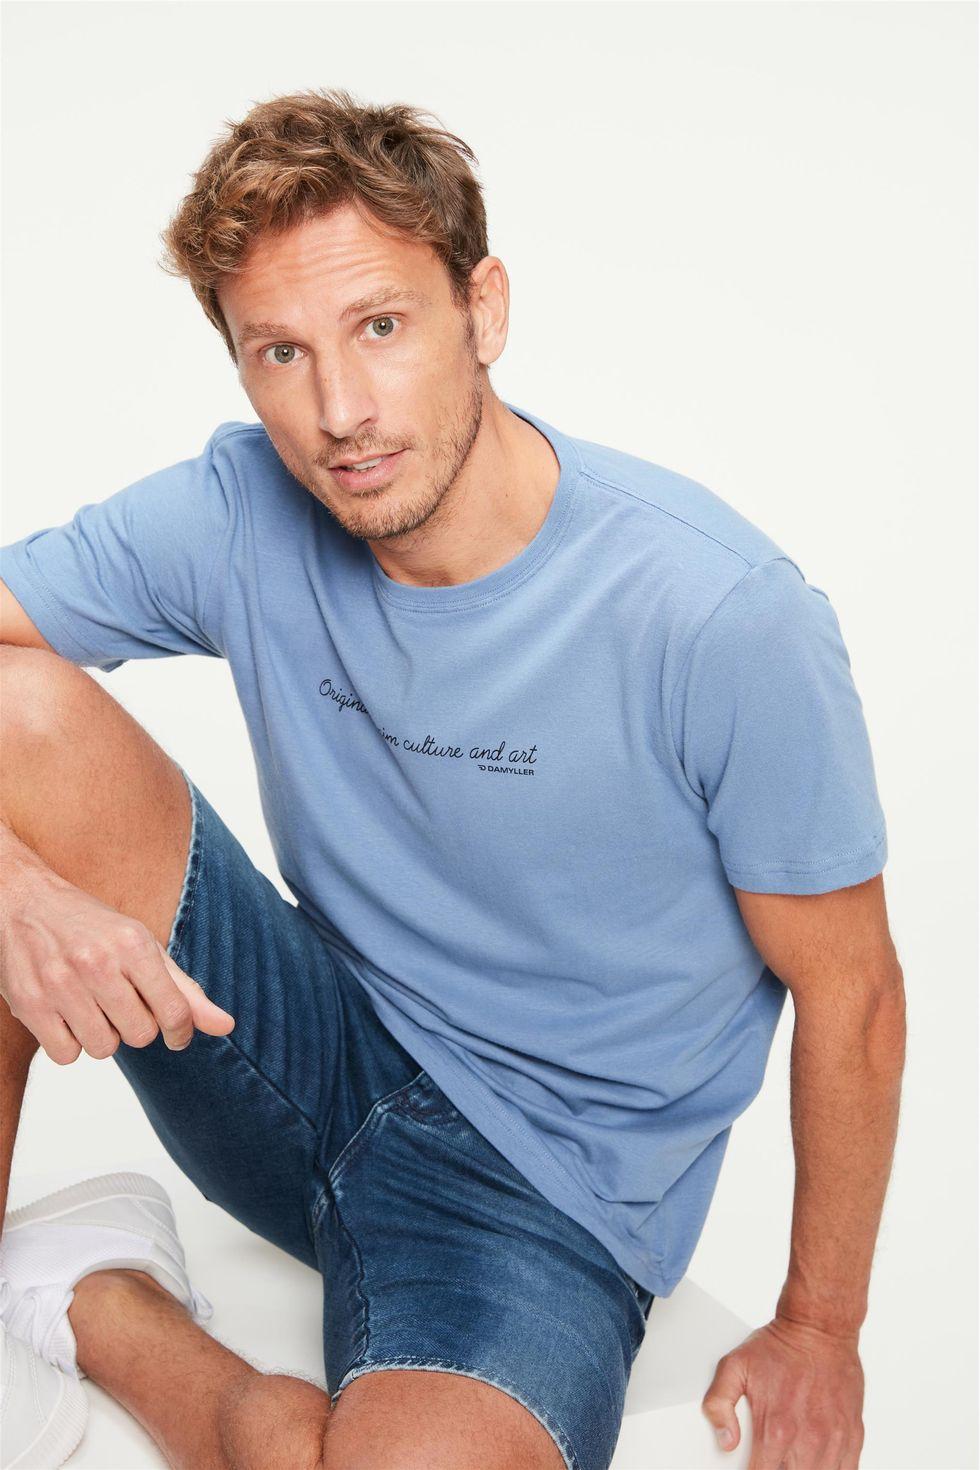 Camiseta-com-Estampa-Original-Denim-Frente--